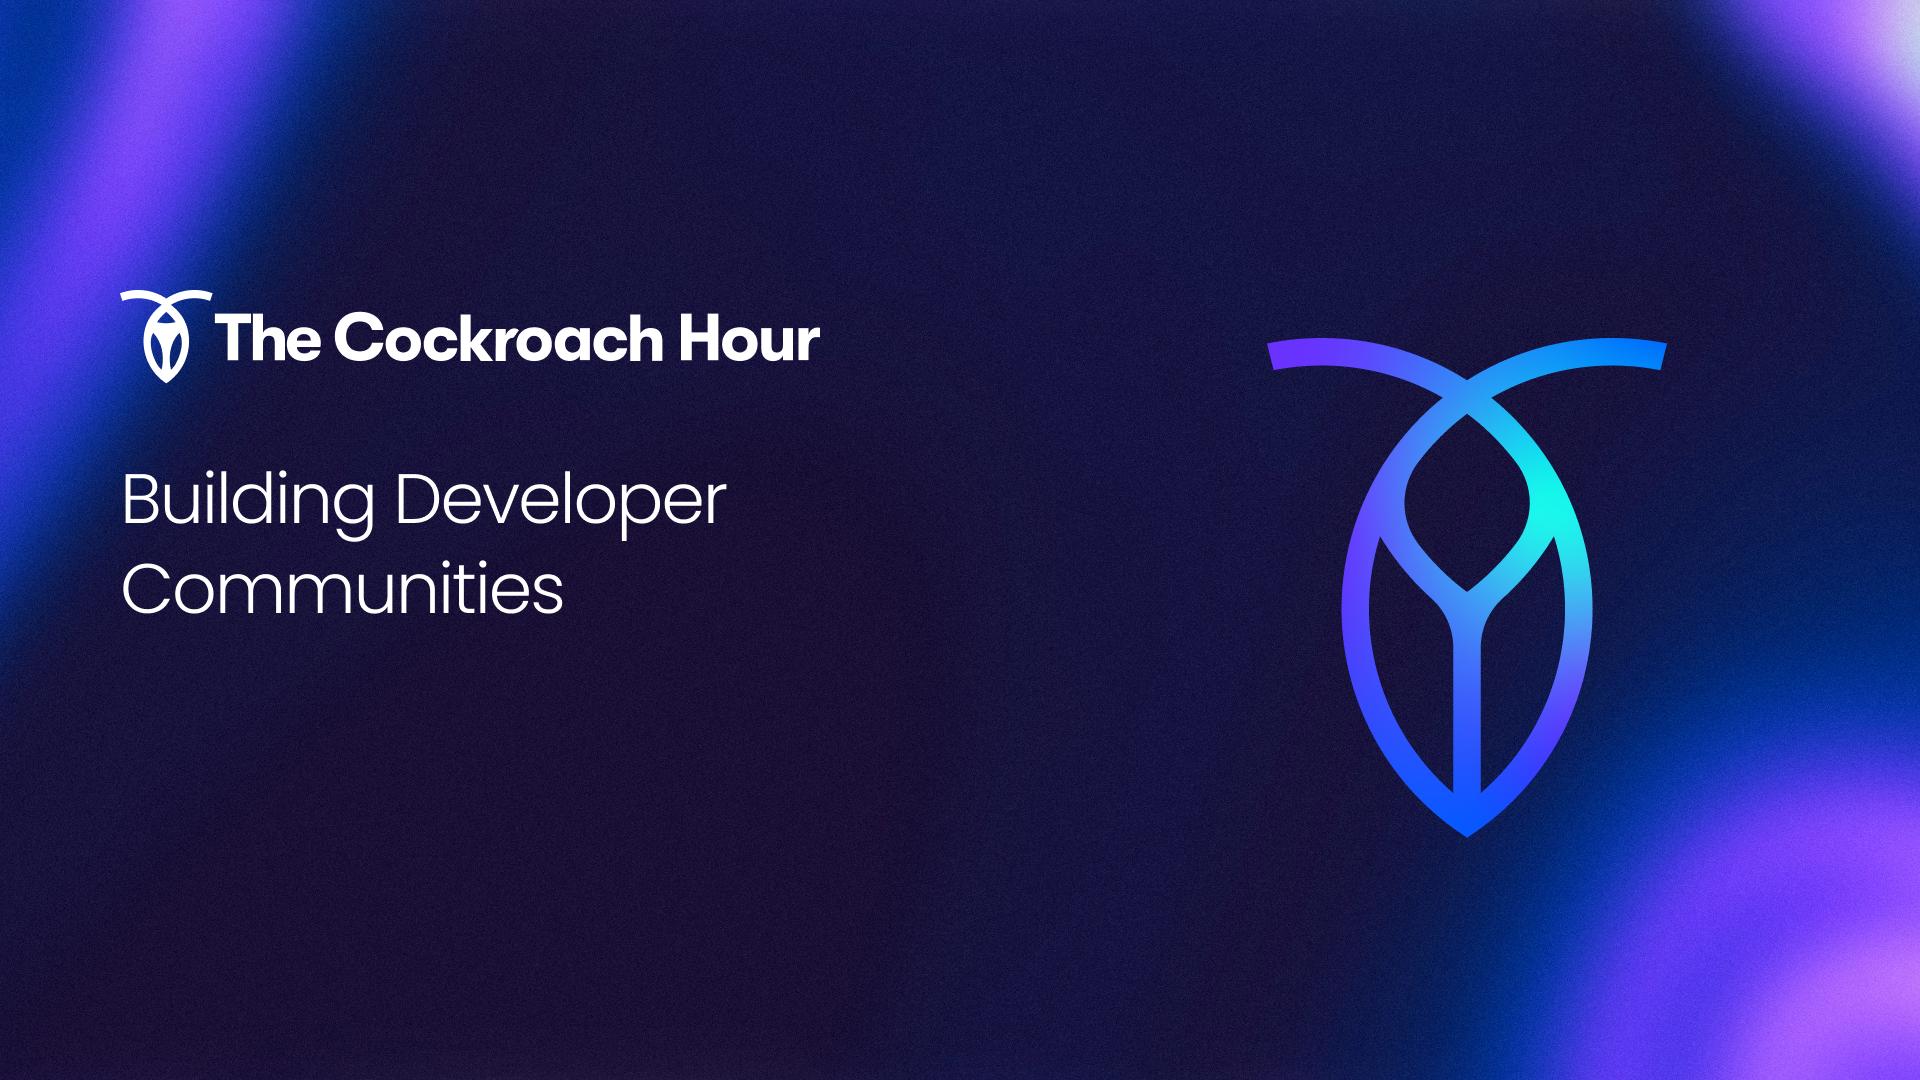 The Cockroach Hour: Building Developer Communities